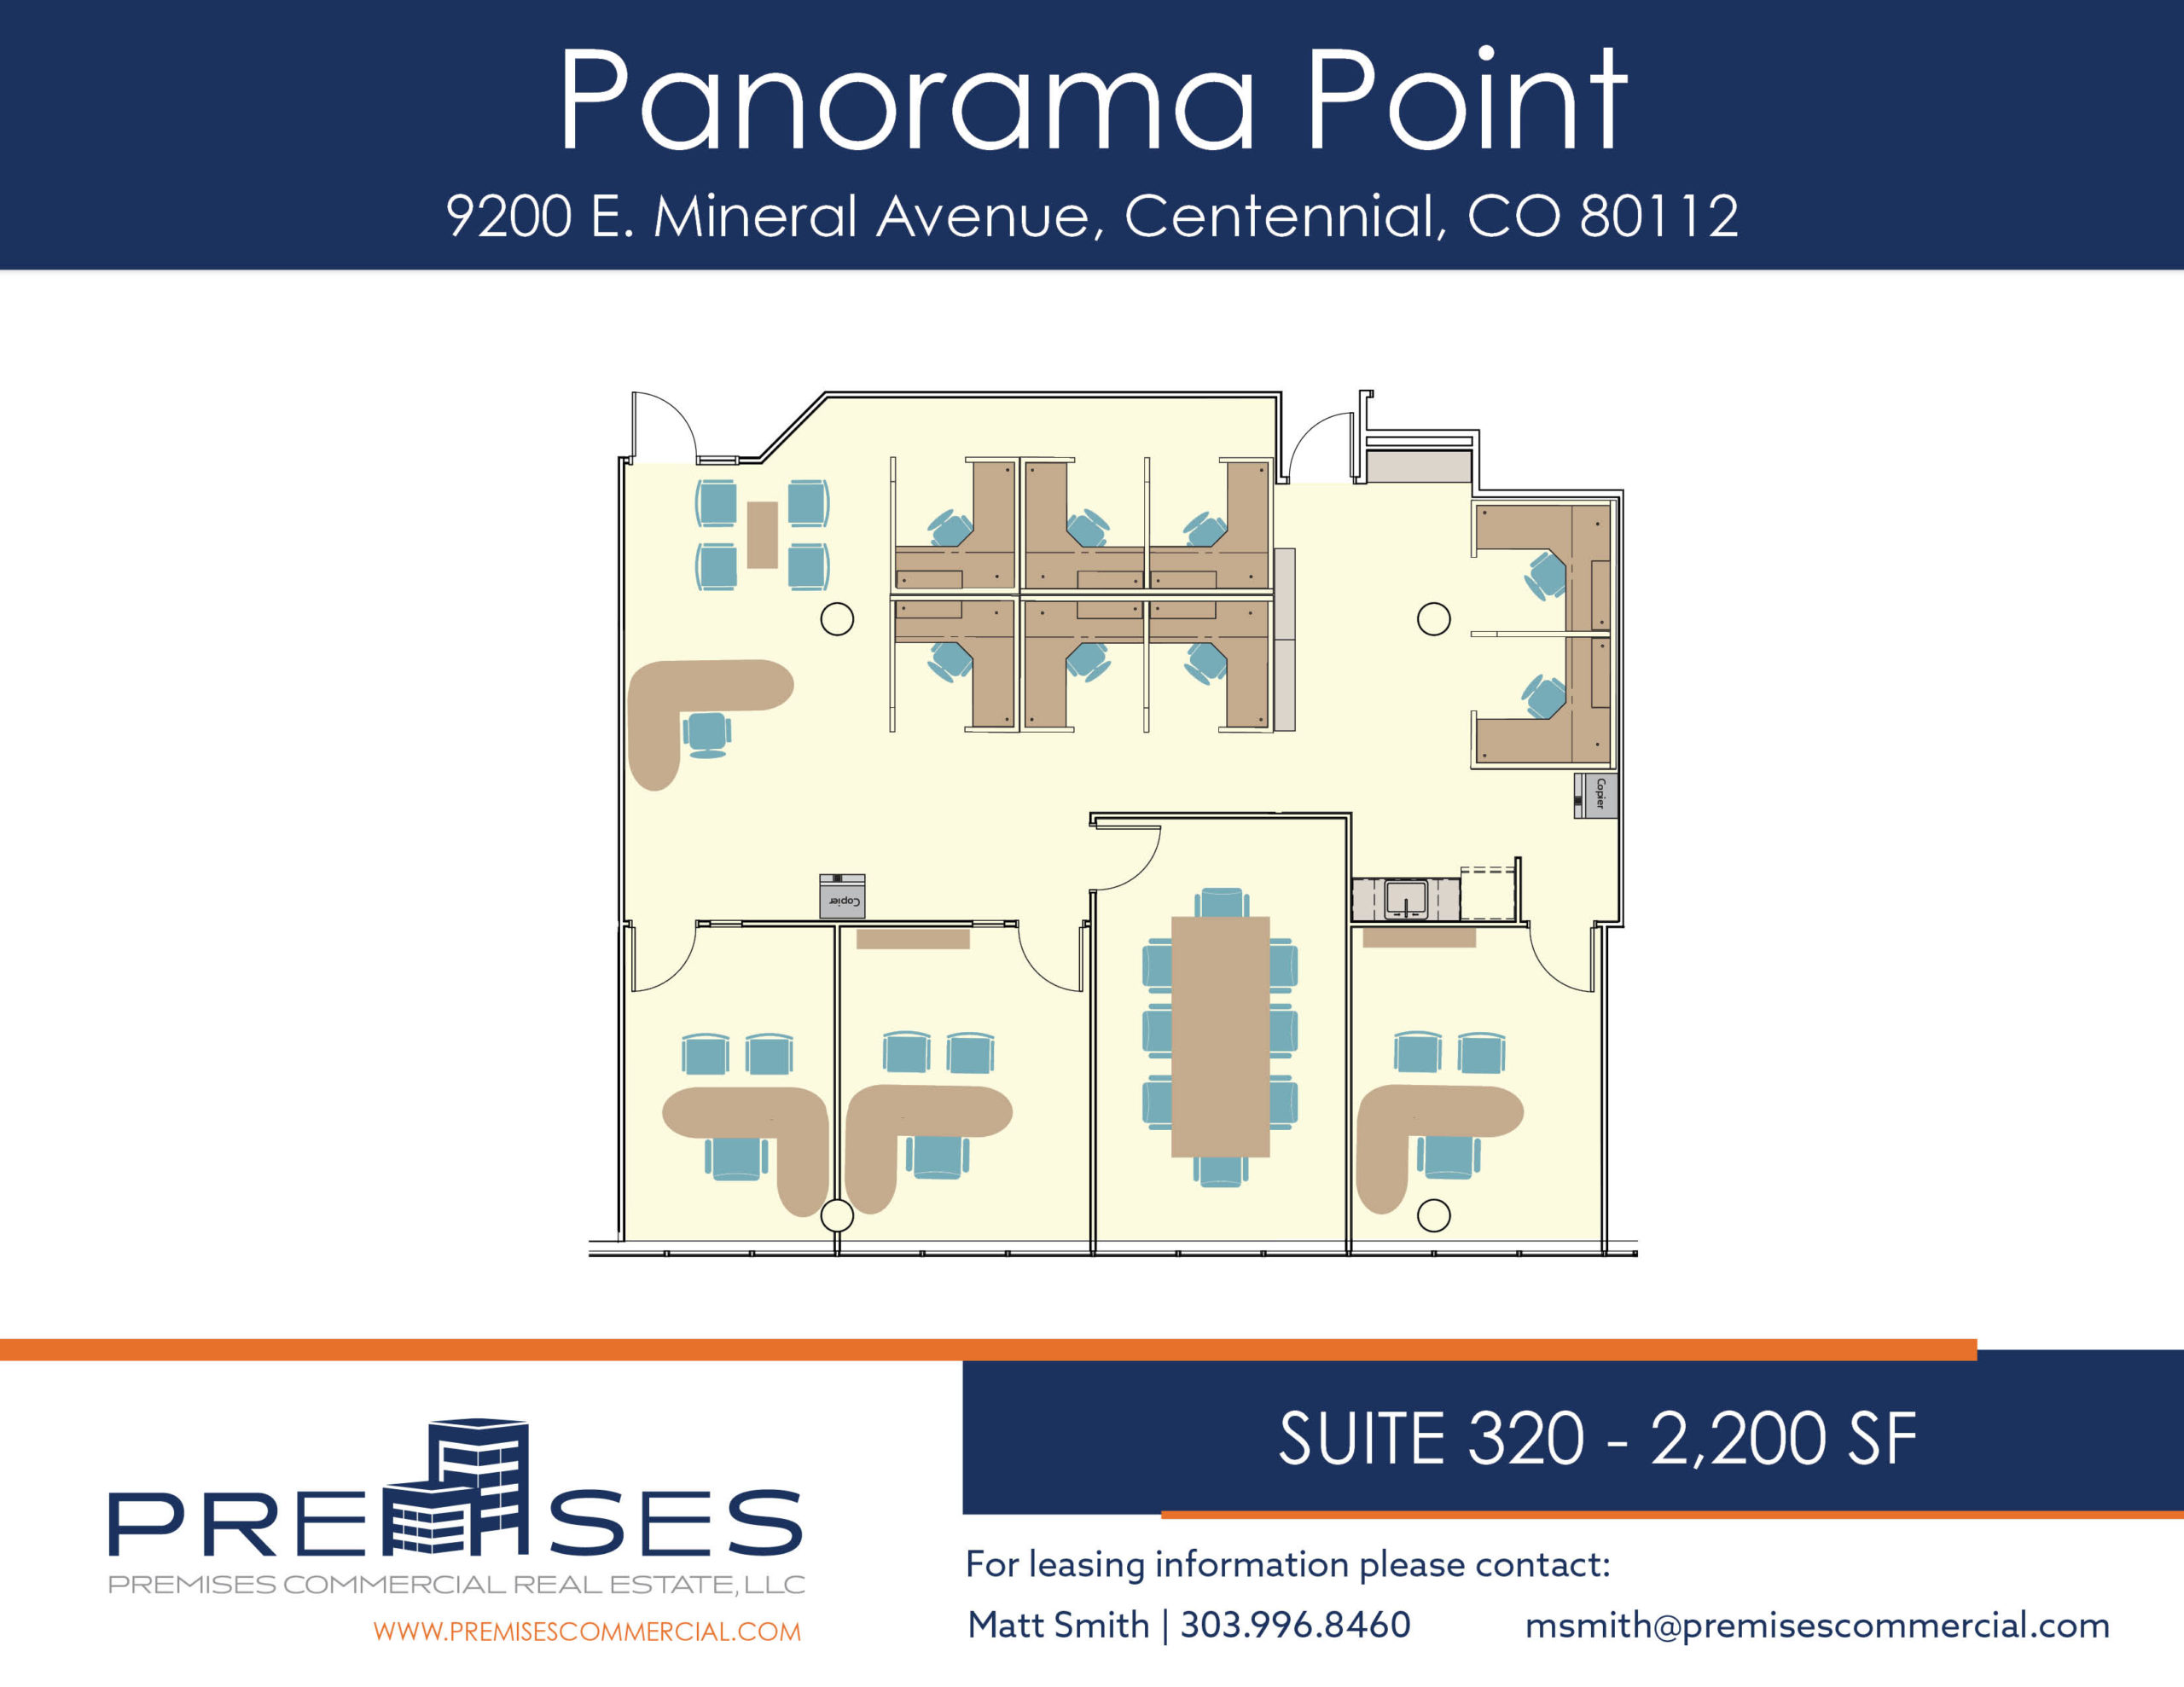 Suite 320 - 2,200 sf